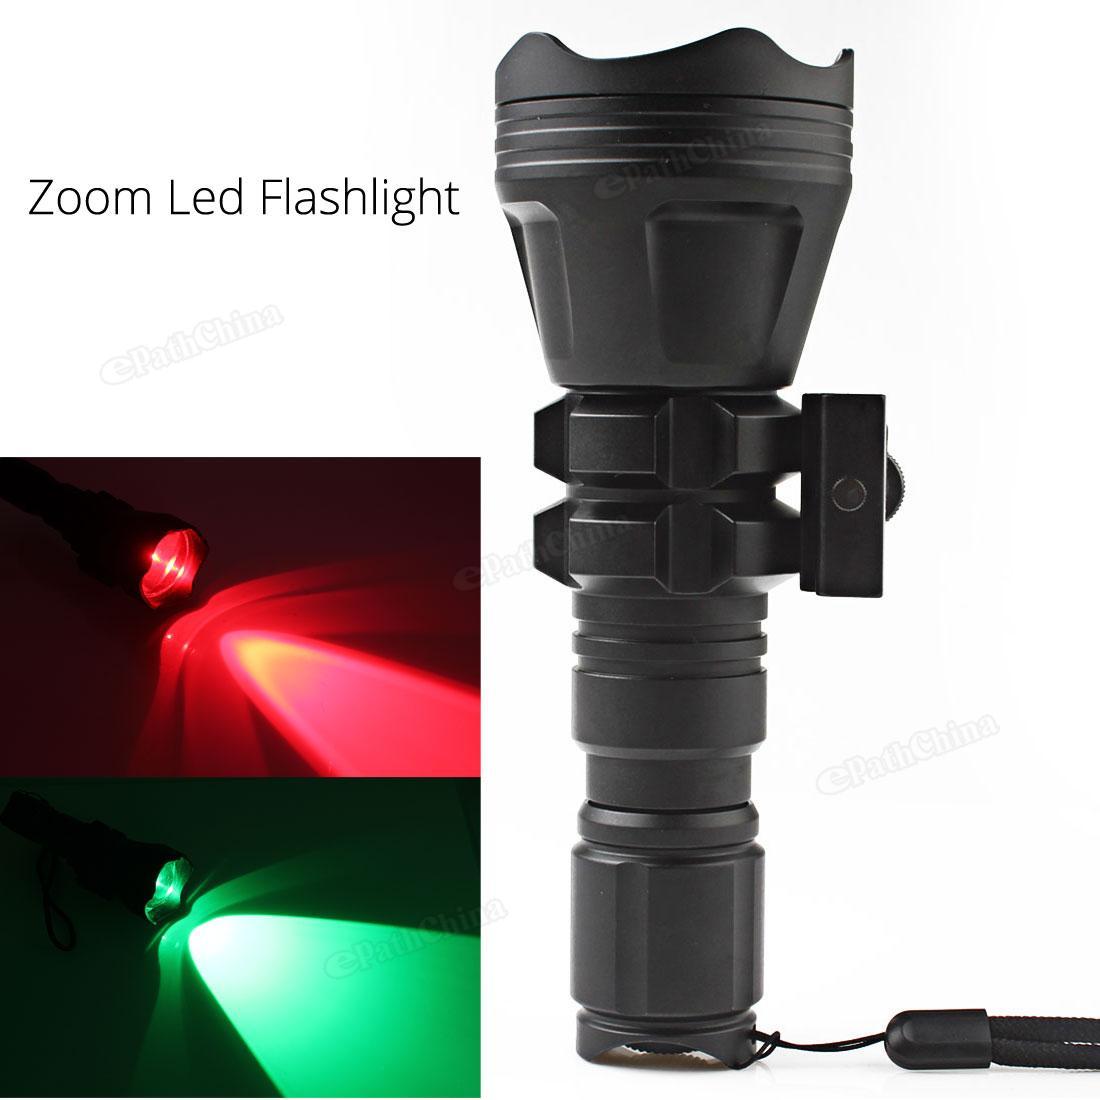 Torches B158 Convex Lens Zoom Flashlight LED Torch Hunting Light Aluminum Self Defense Tactical Flashlight Red Green